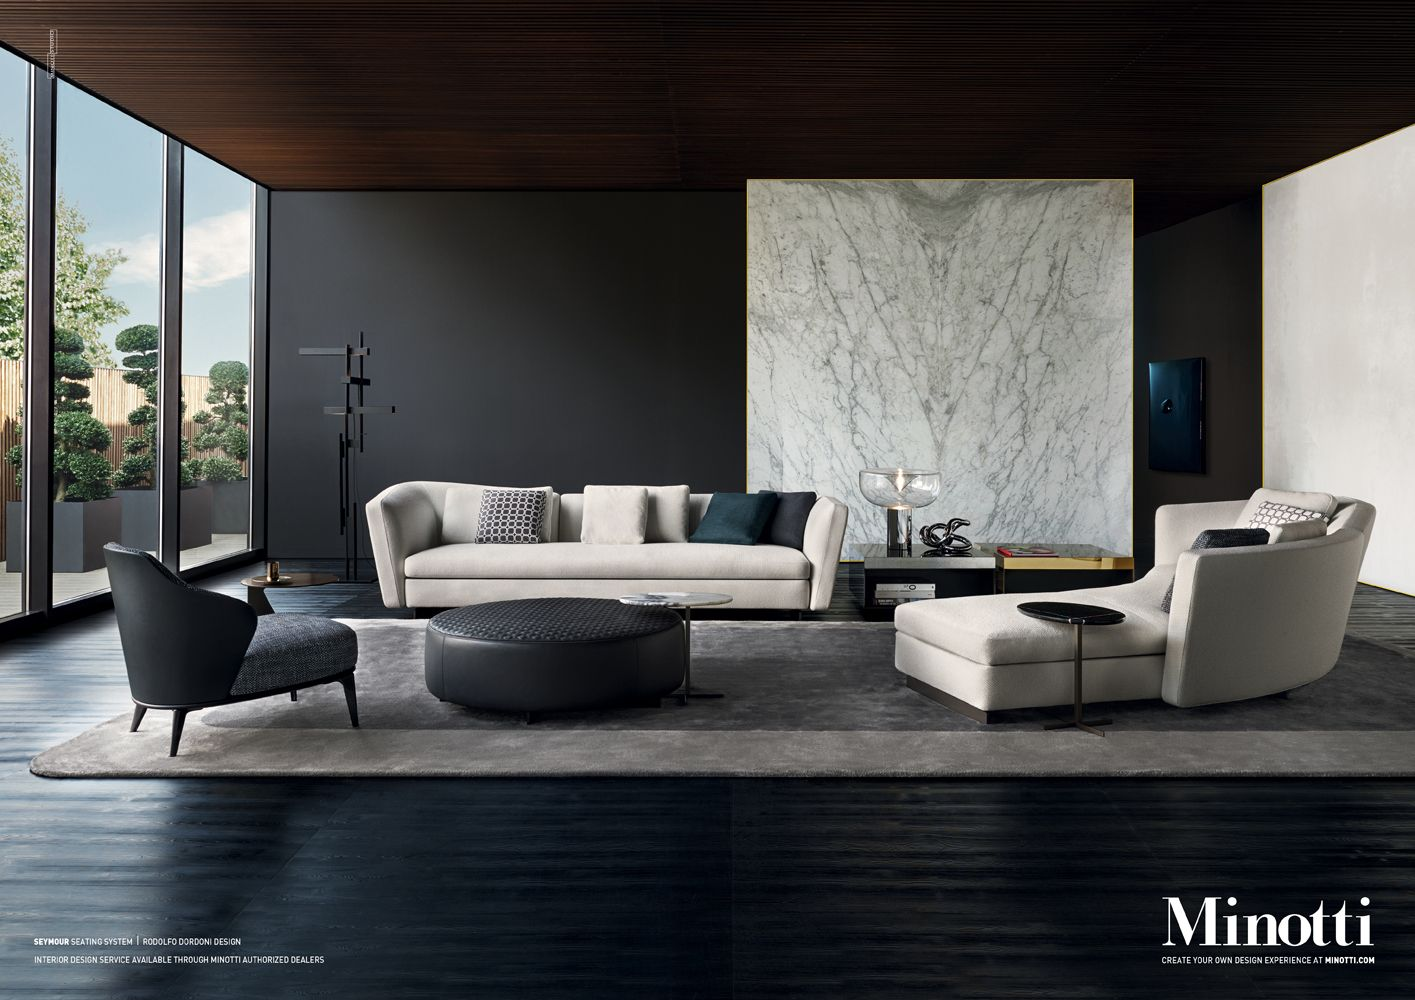 Seymour seating system, Rodolfo Dordoni Design #adv #seymour #sofa #seatingsystem #rodolfodordoni